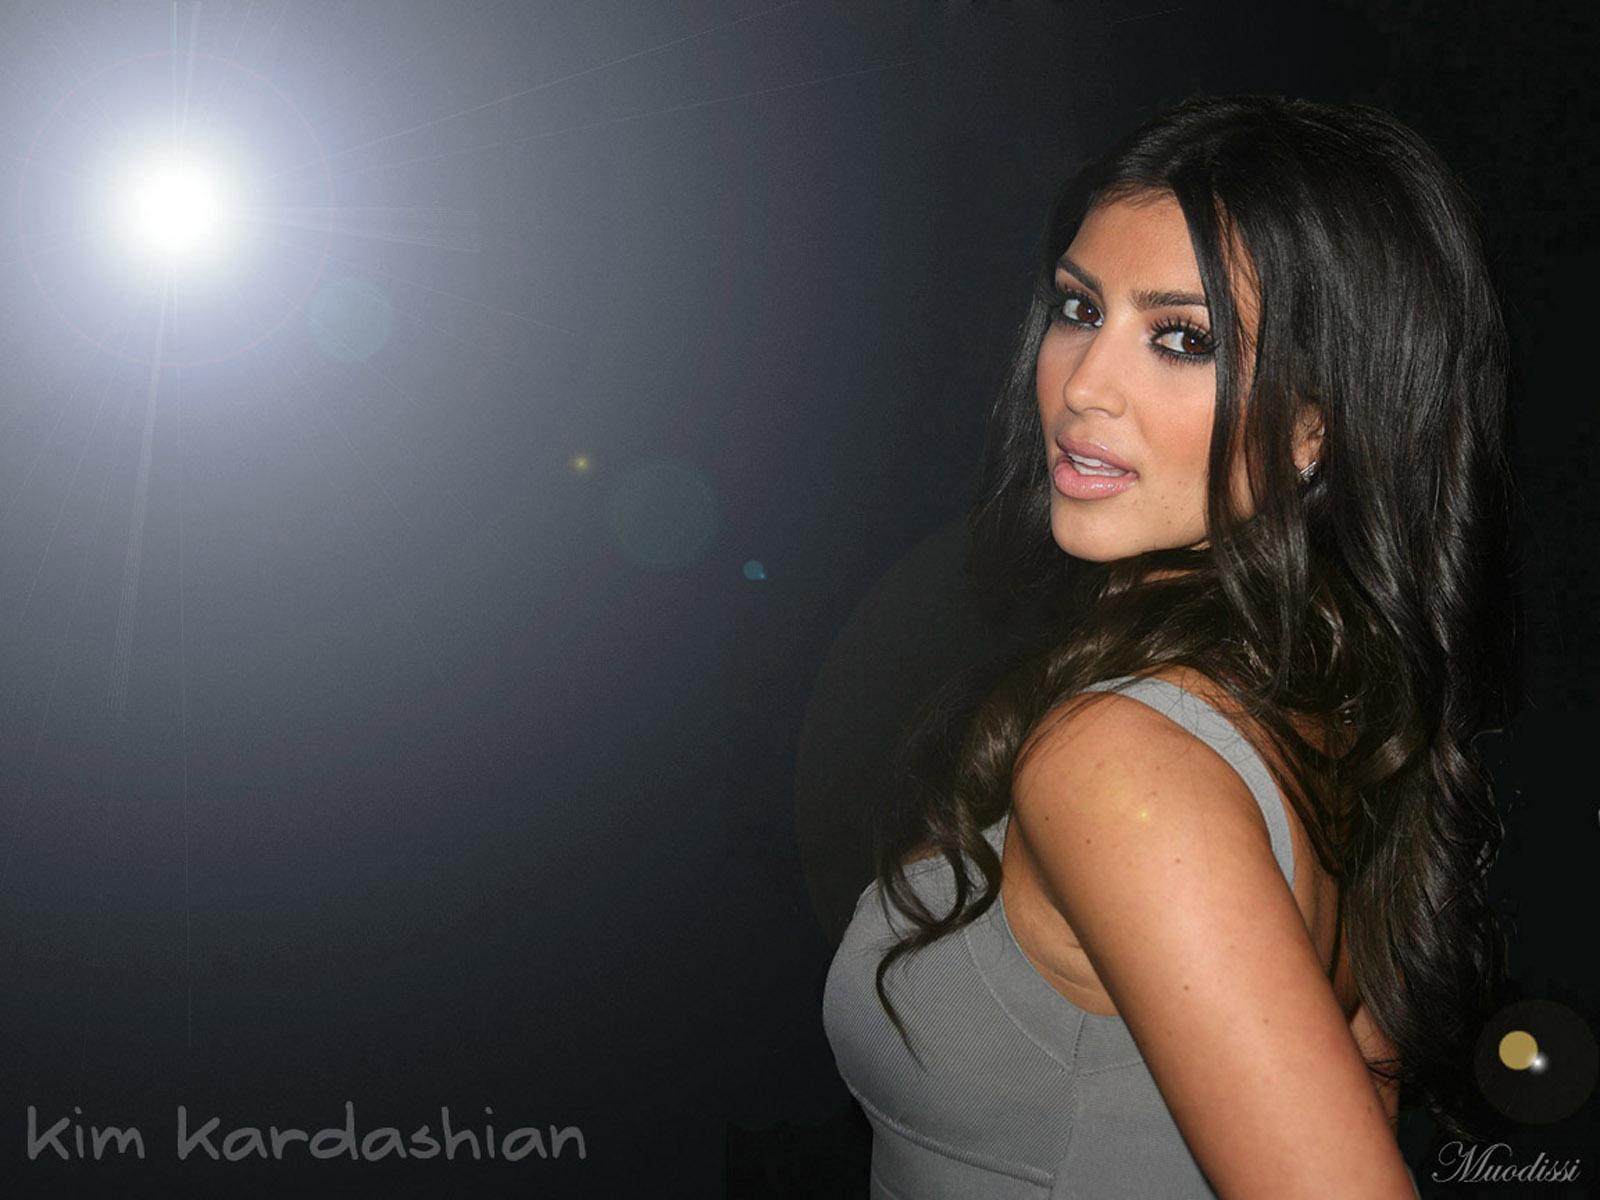 kim kardashiankim kardashian pregnantkim kardashian wallpaperkim 1600x1200